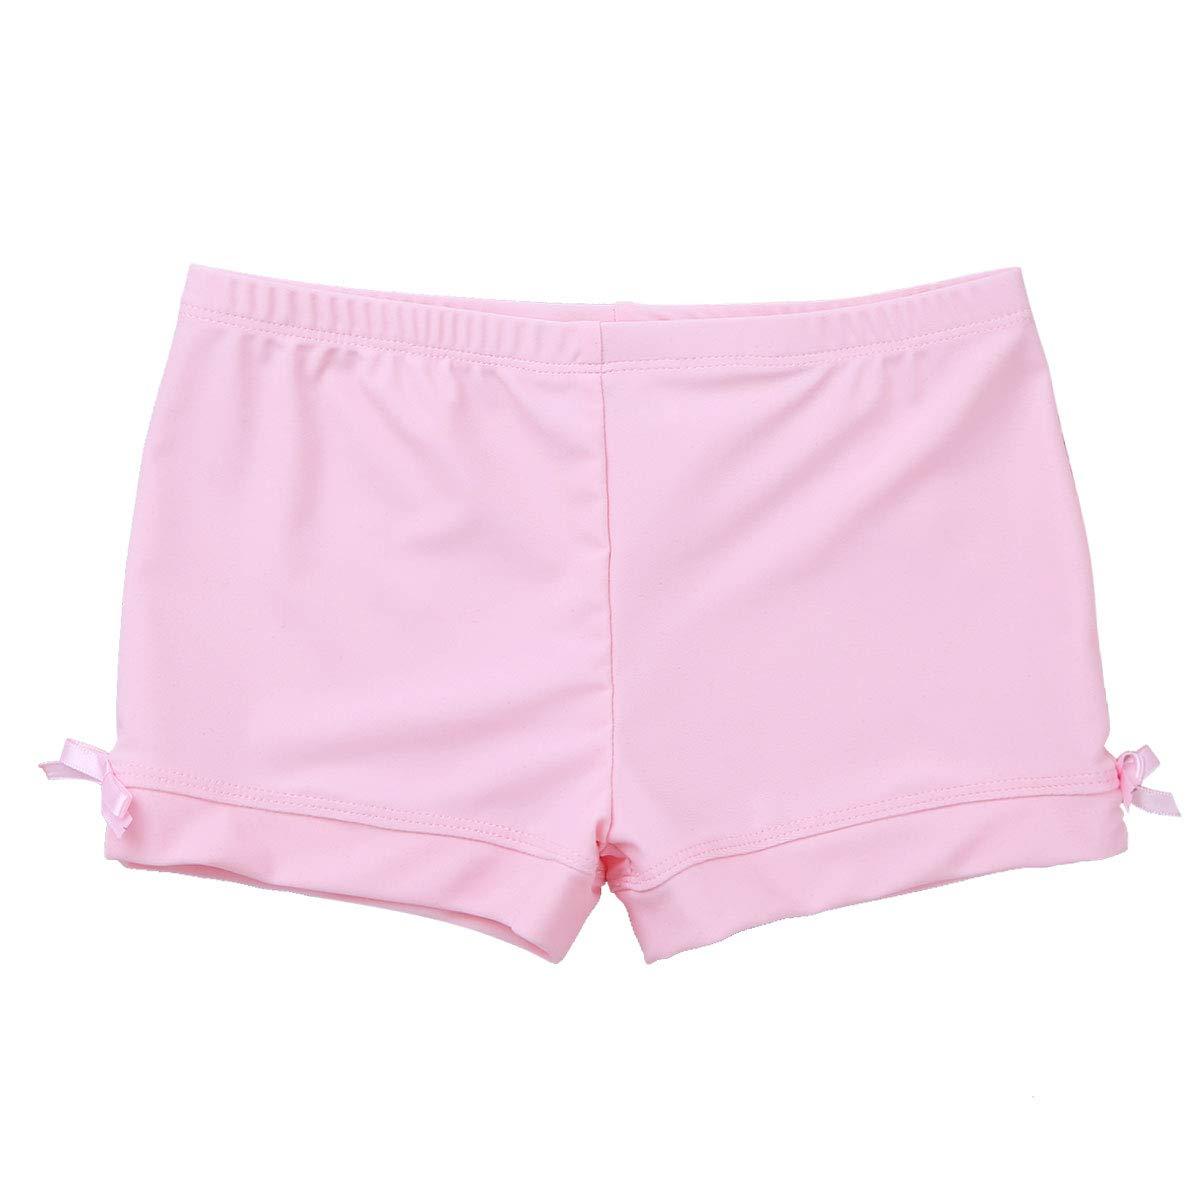 Agoky Kids Girls Gymnastics Workout Yoga Athletic Sports Training Bike Short Pink Boy-Cut 3